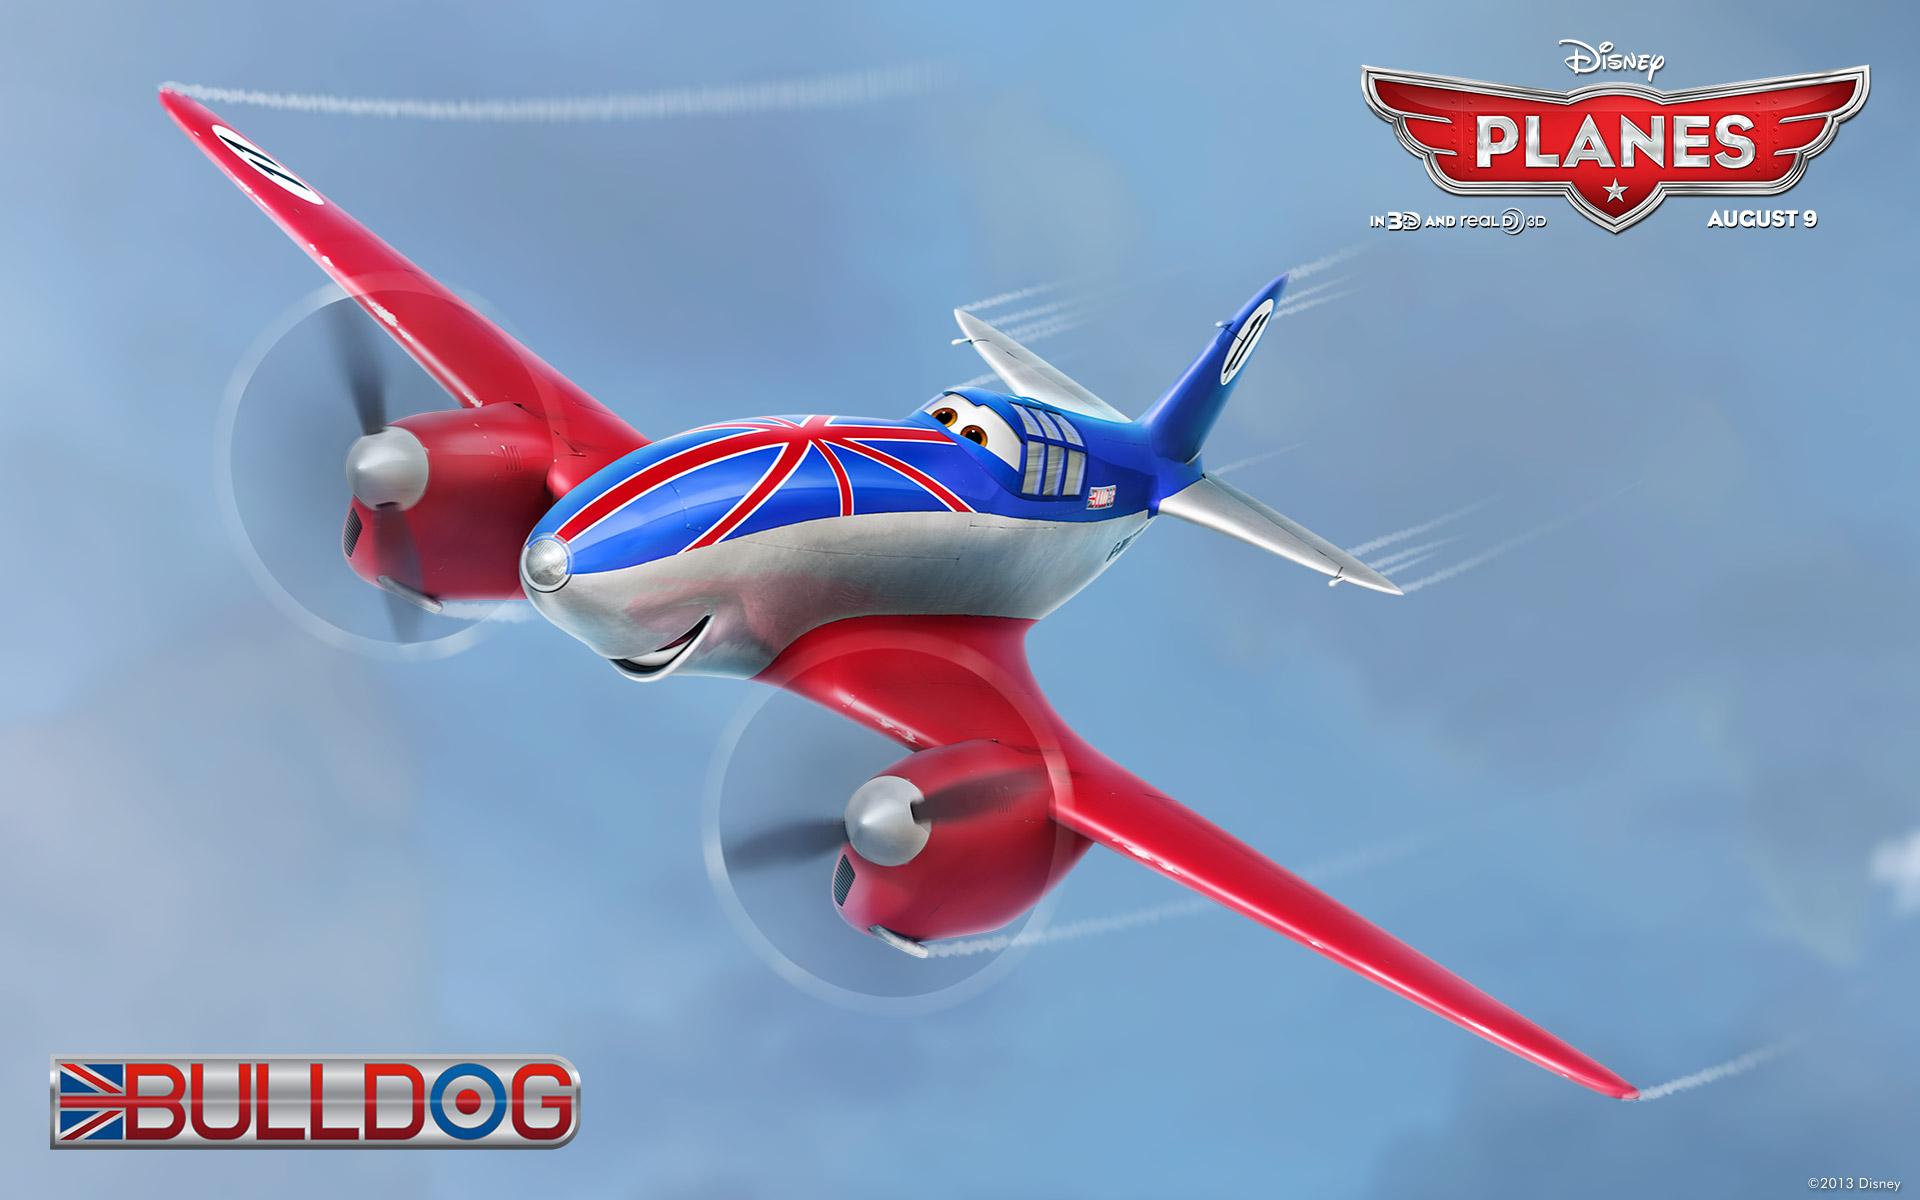 disney planes bulldog wallpaper 50458